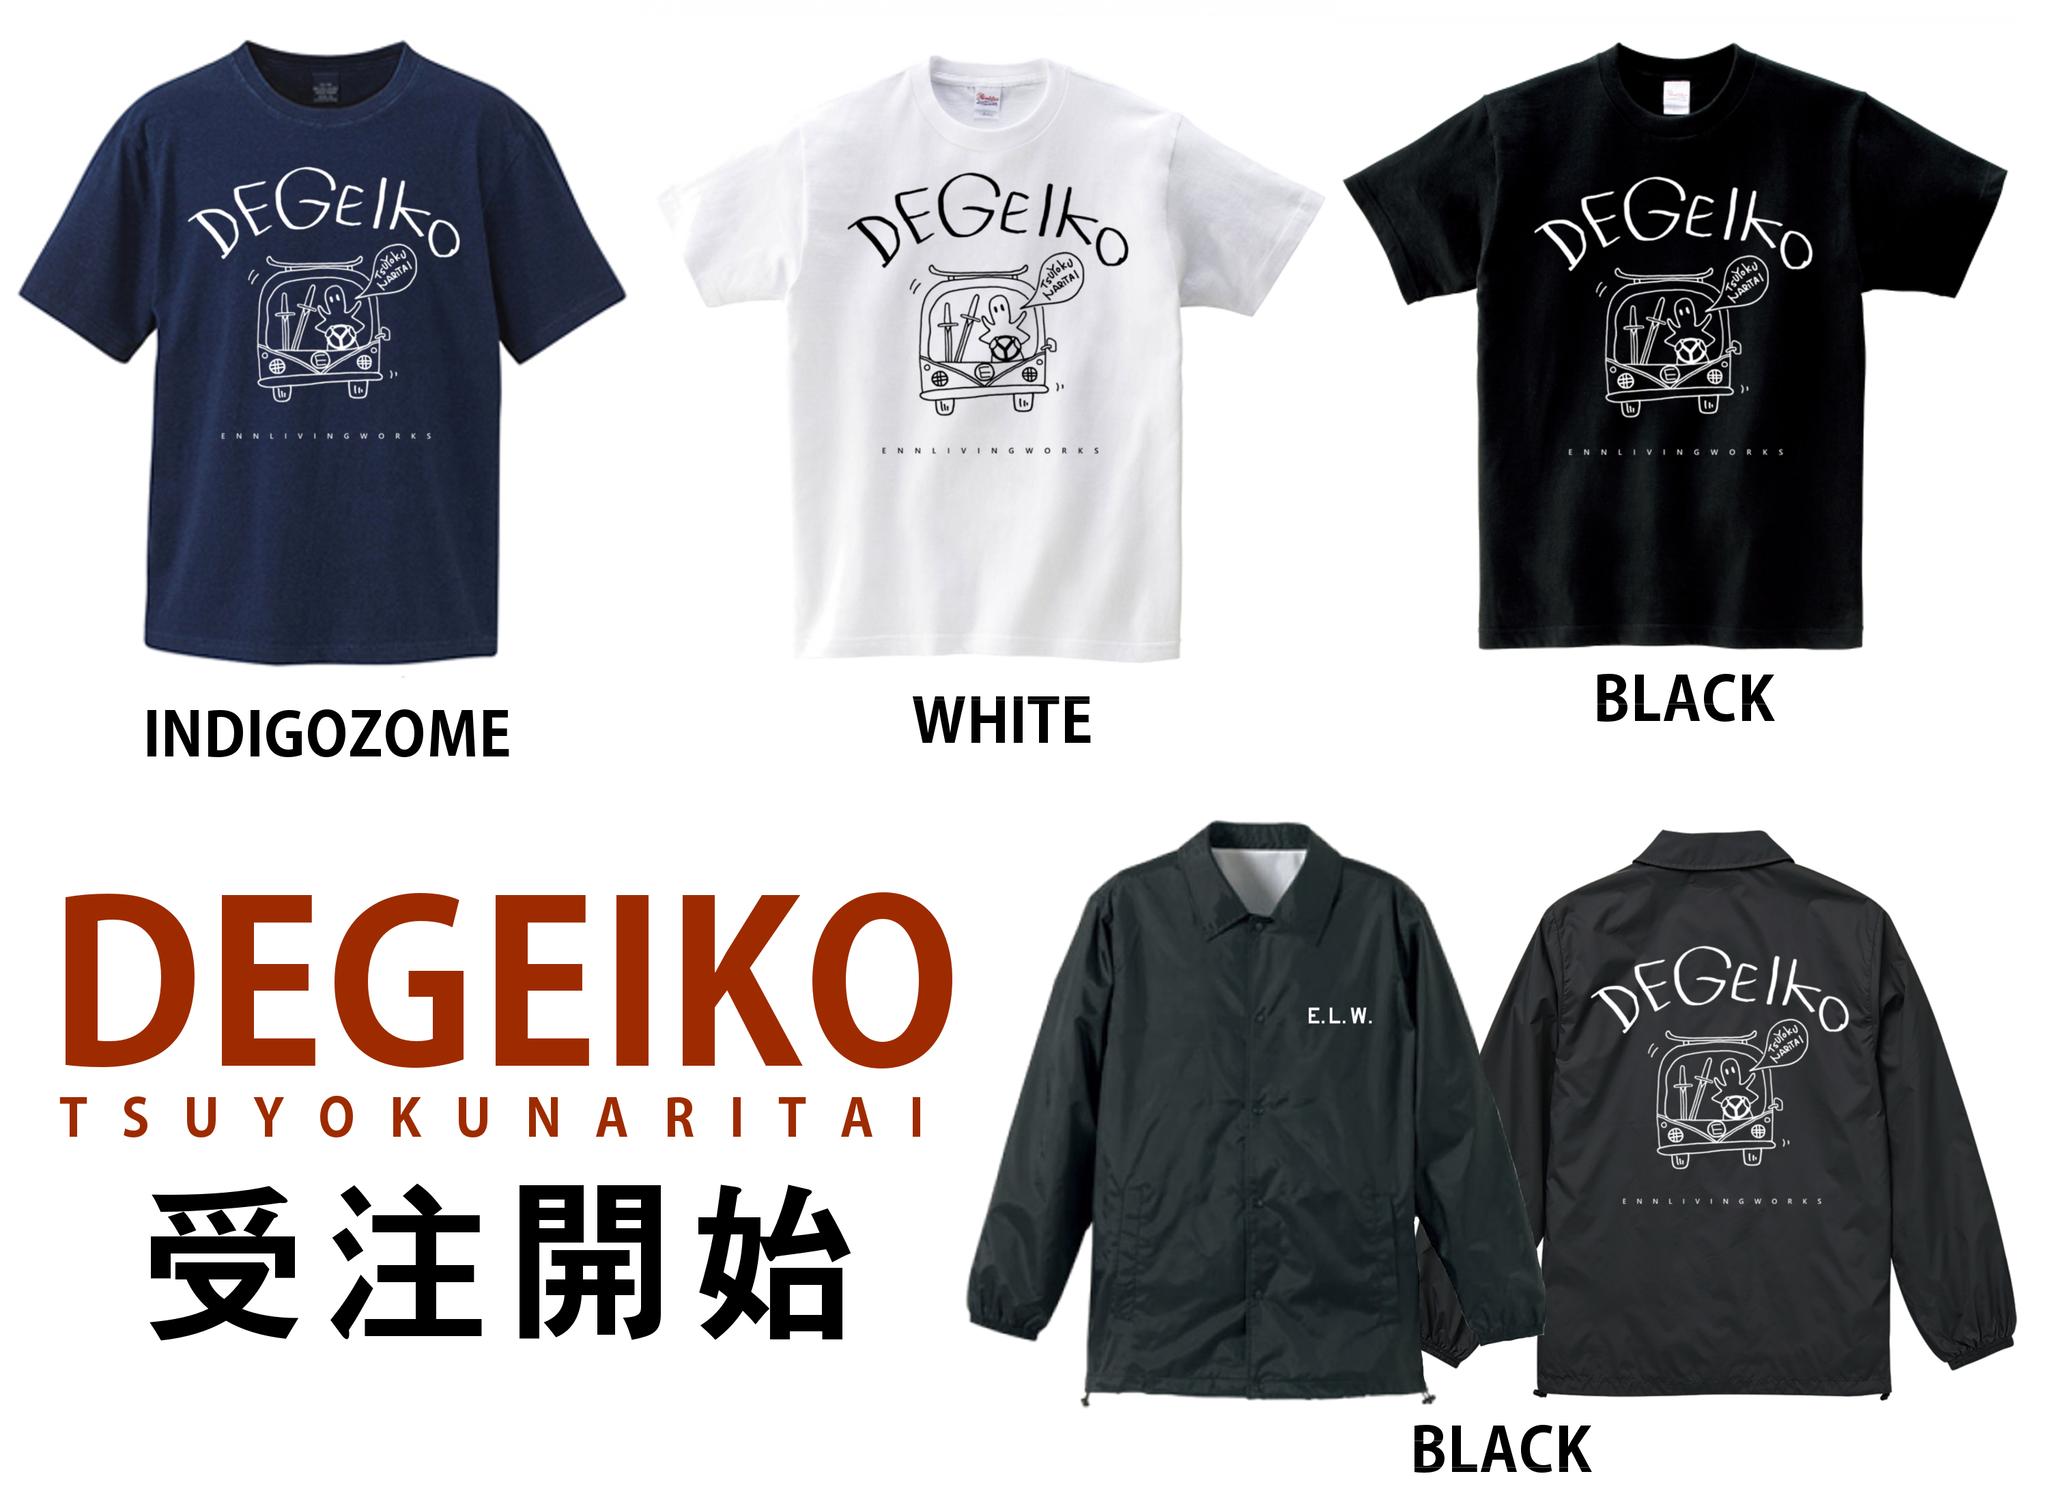 DEGEIKO(出稽古)Tシャツ受注開始!